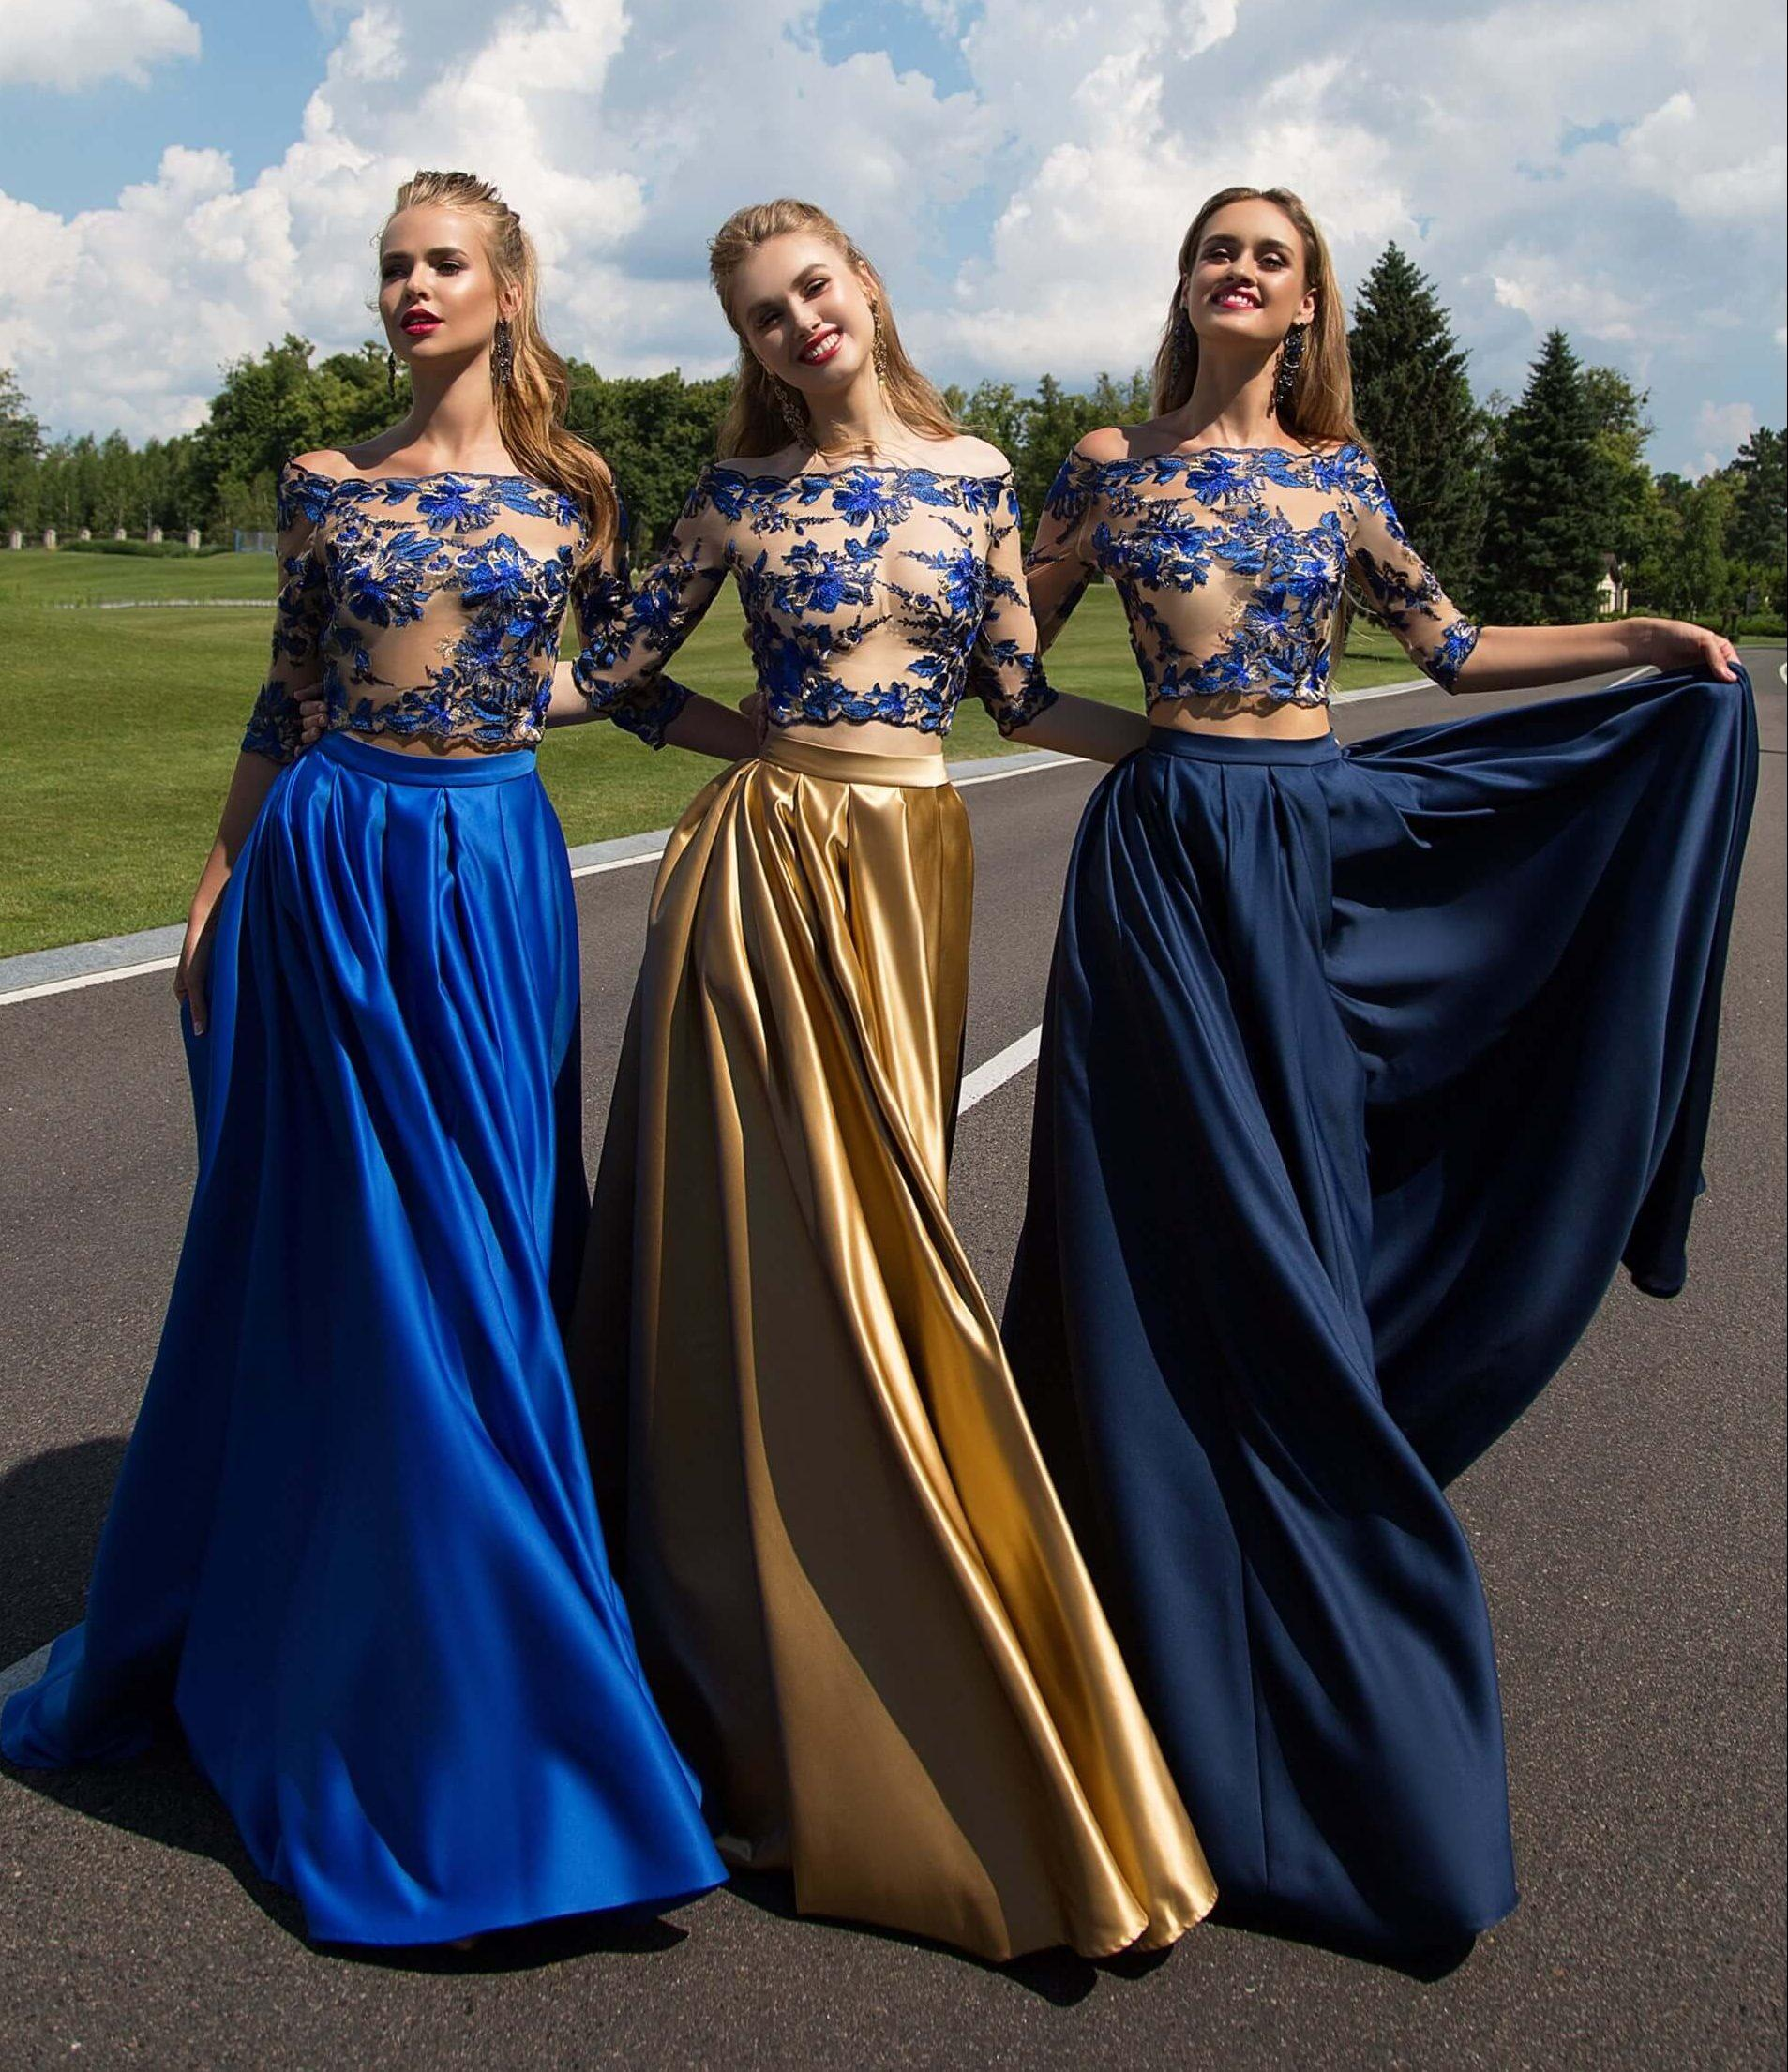 dolga_svecana_maturantska_obleka